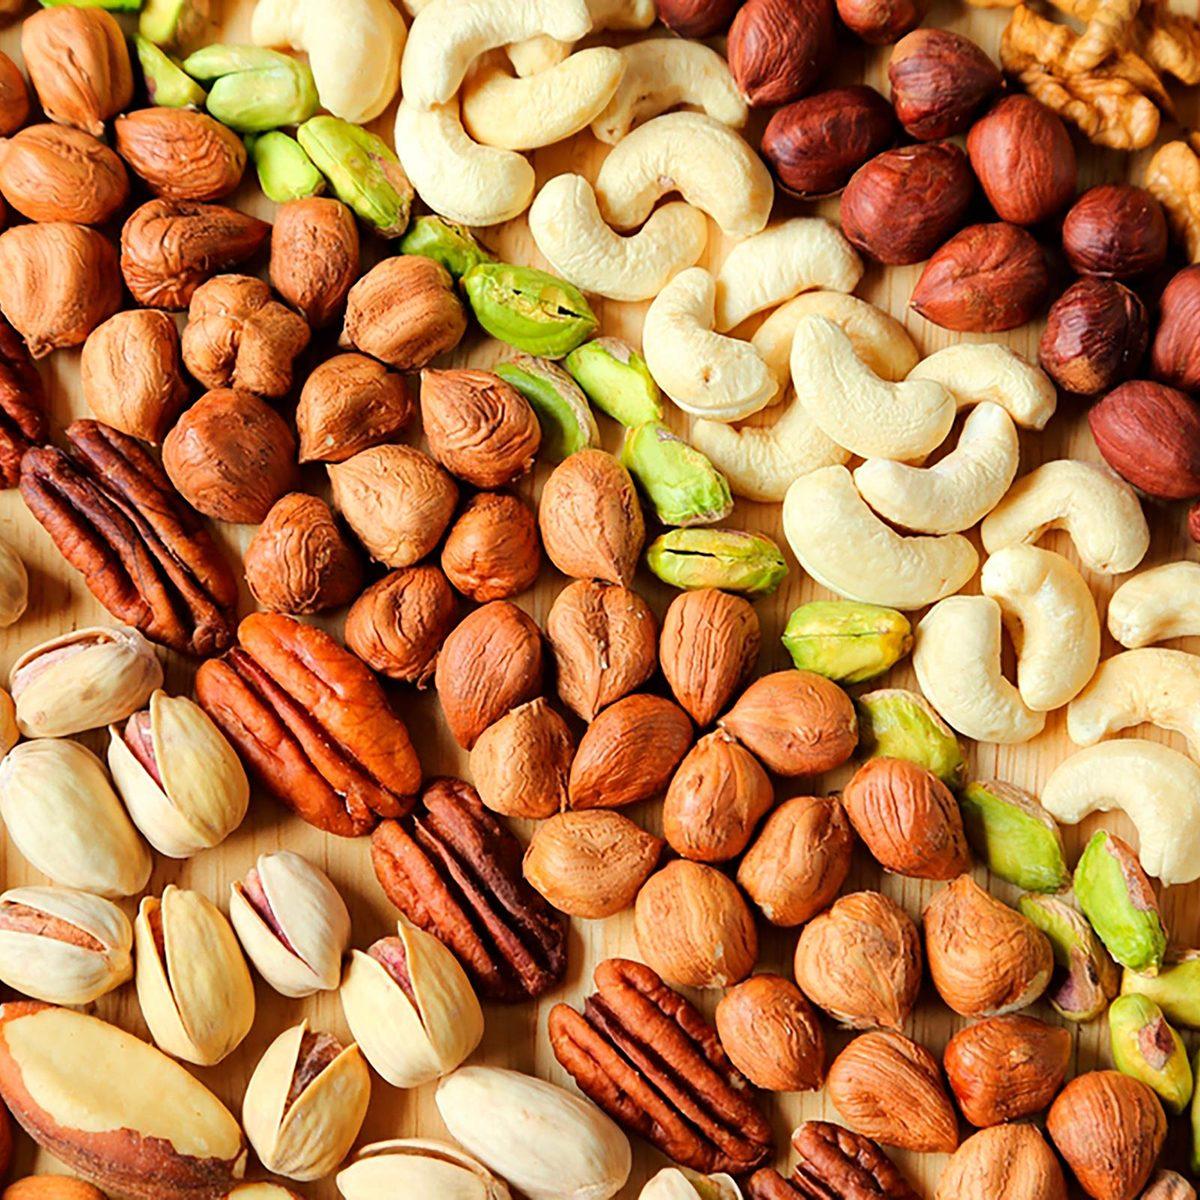 Bulk nuts